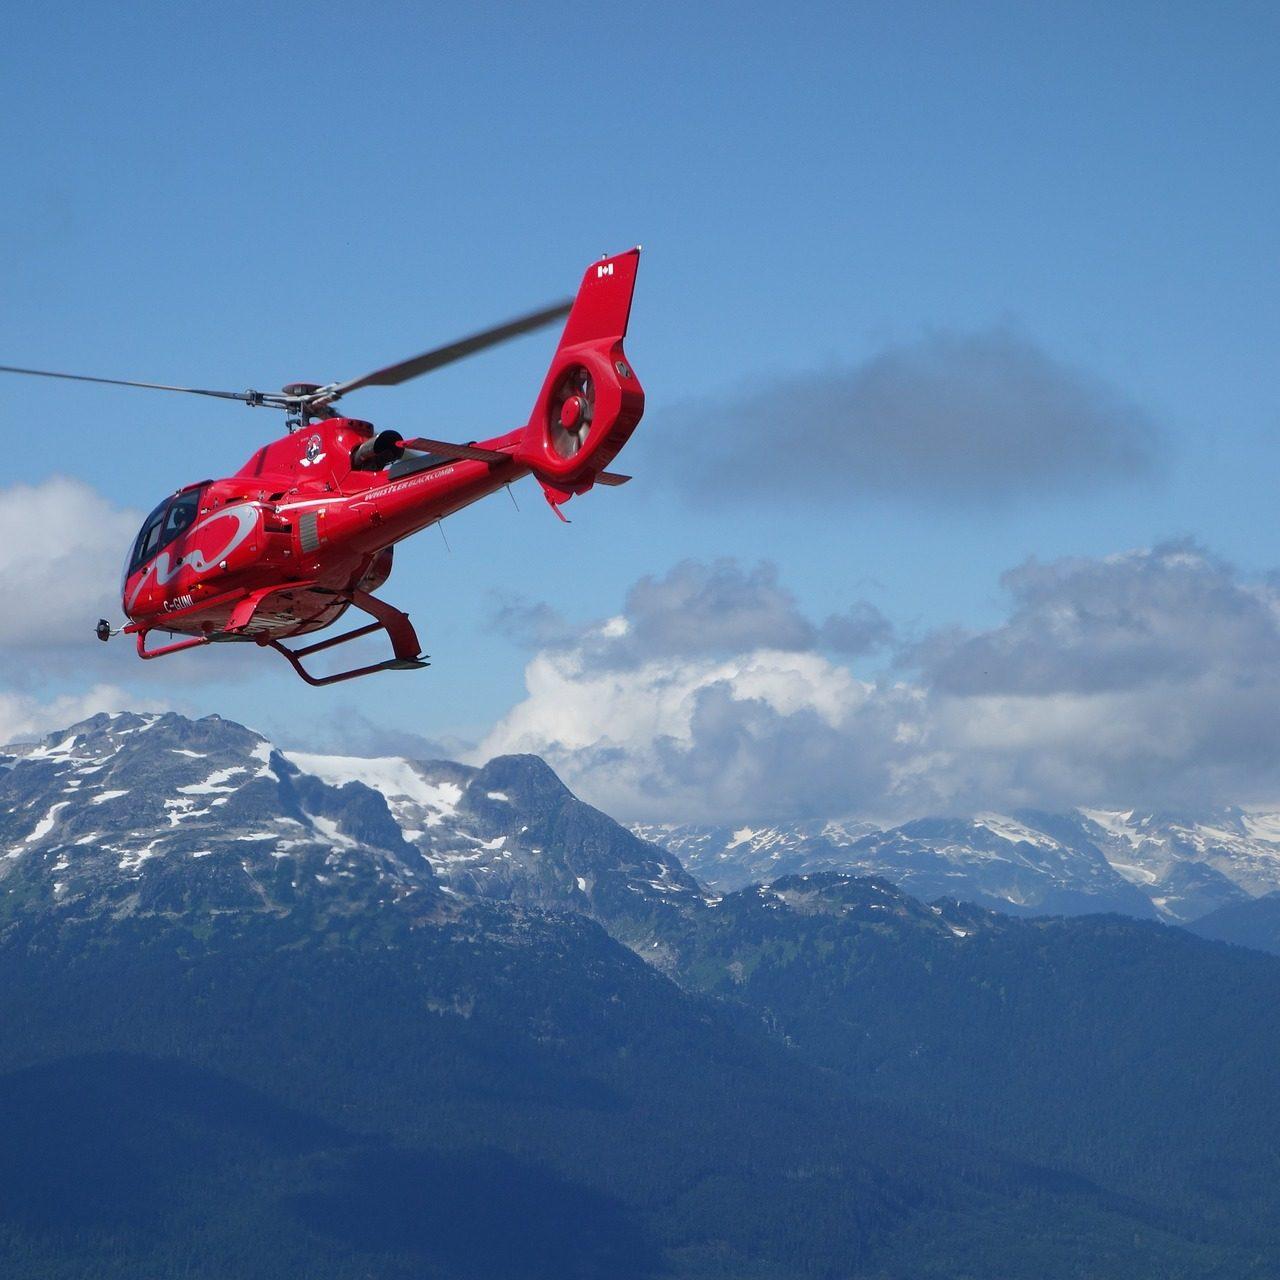 Helikopterflug-Bodensee